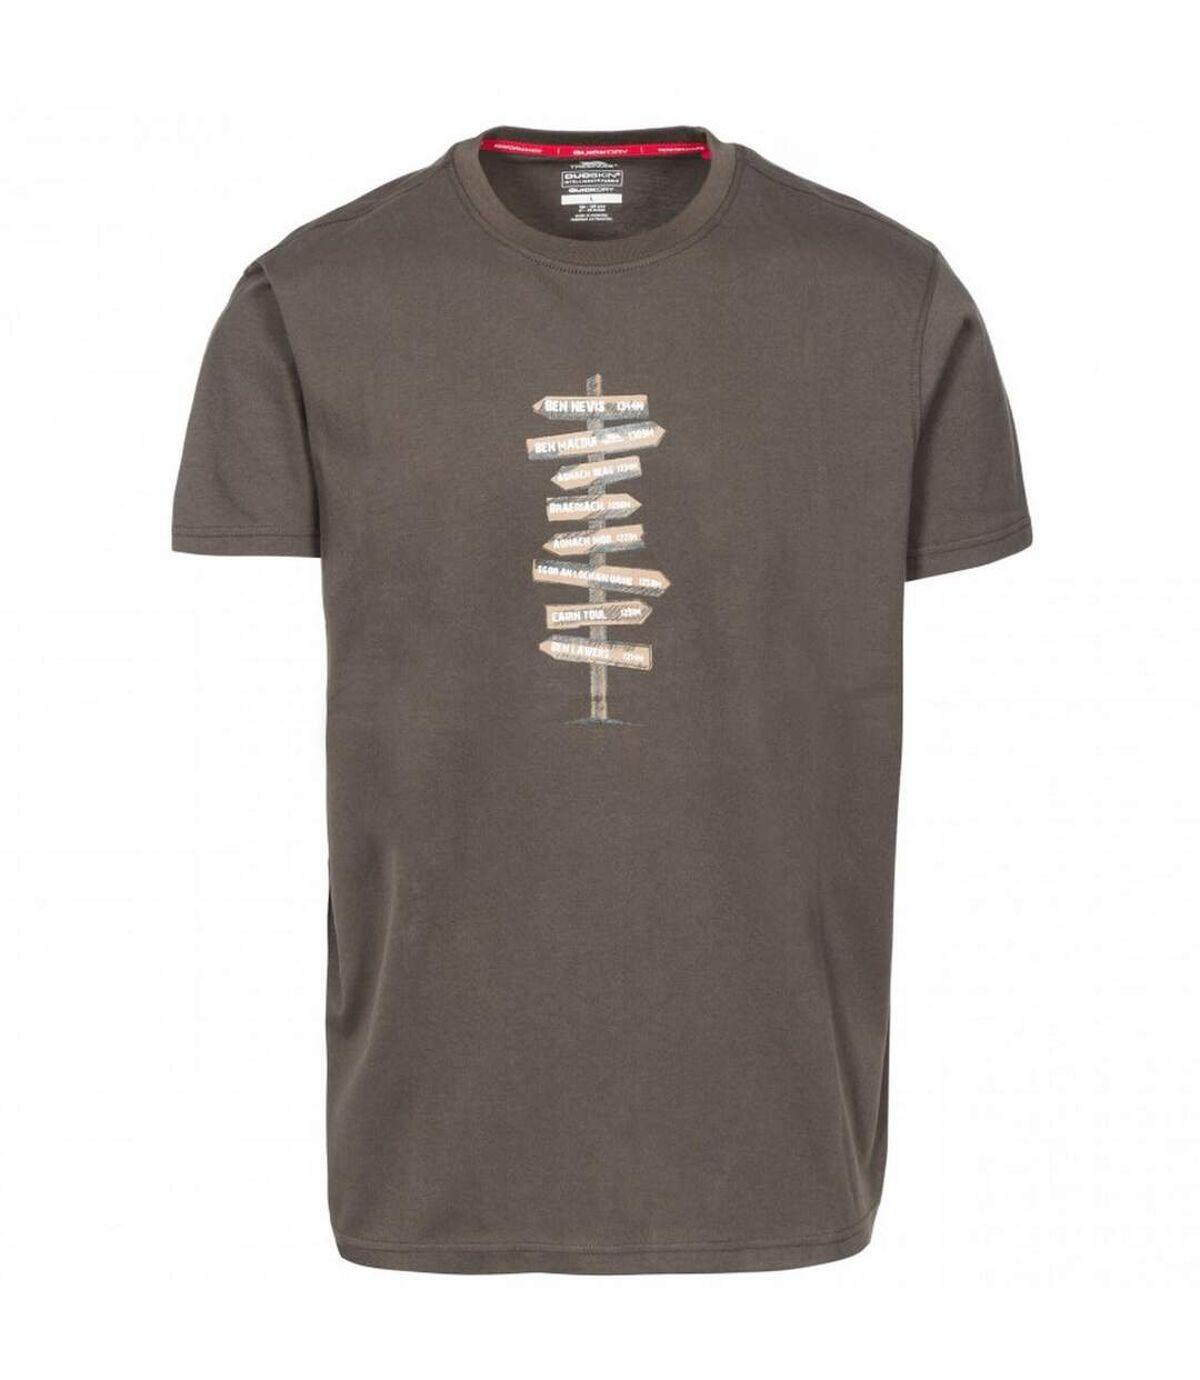 Trespass Mens Mapping T-Shirt (Khaki) - UTTP4308